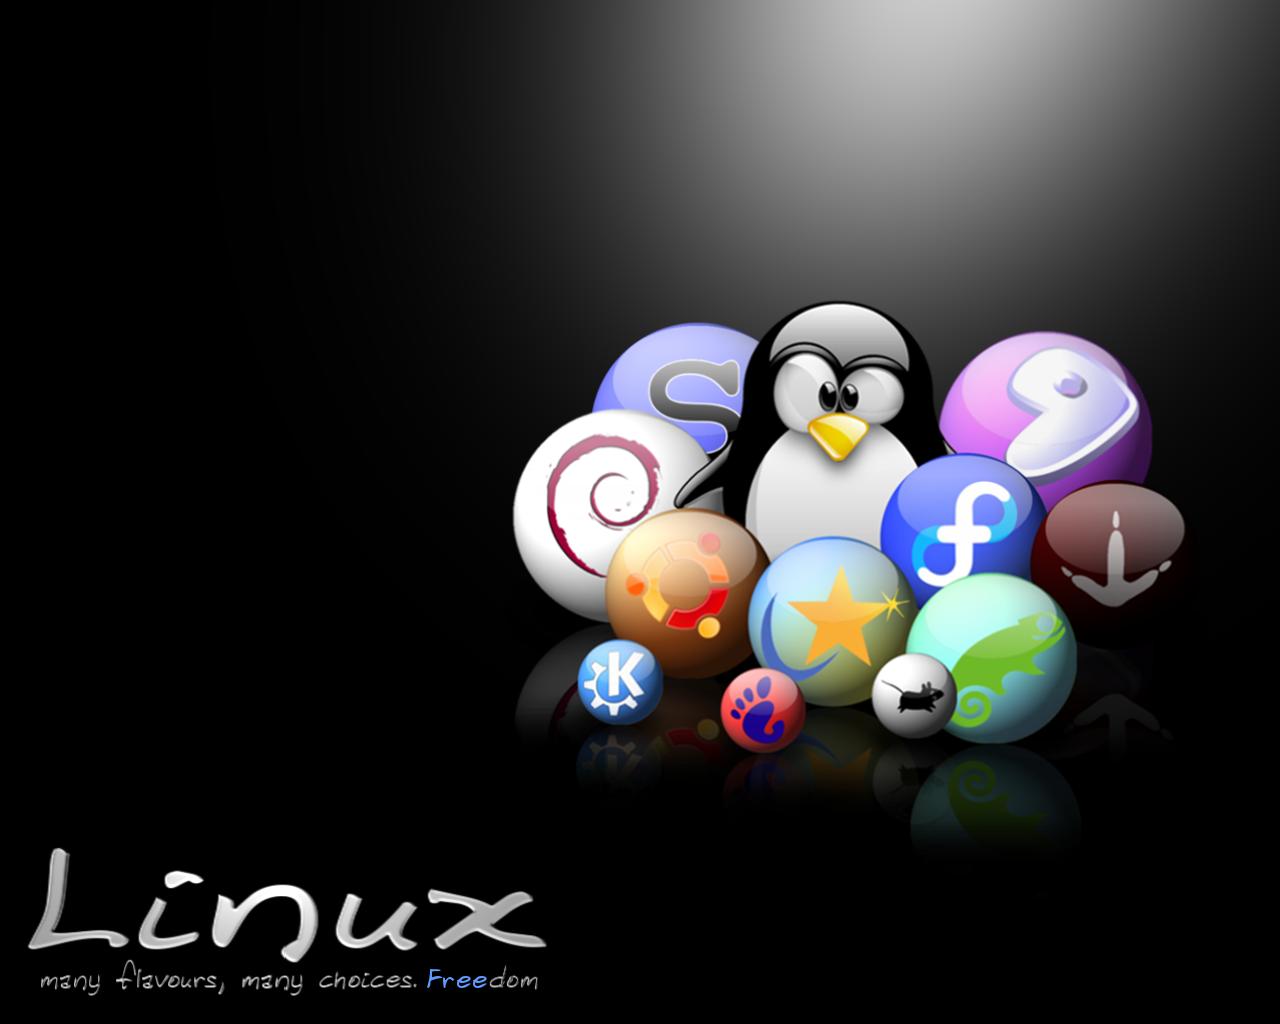 Linux LinuxByte 1280x1024